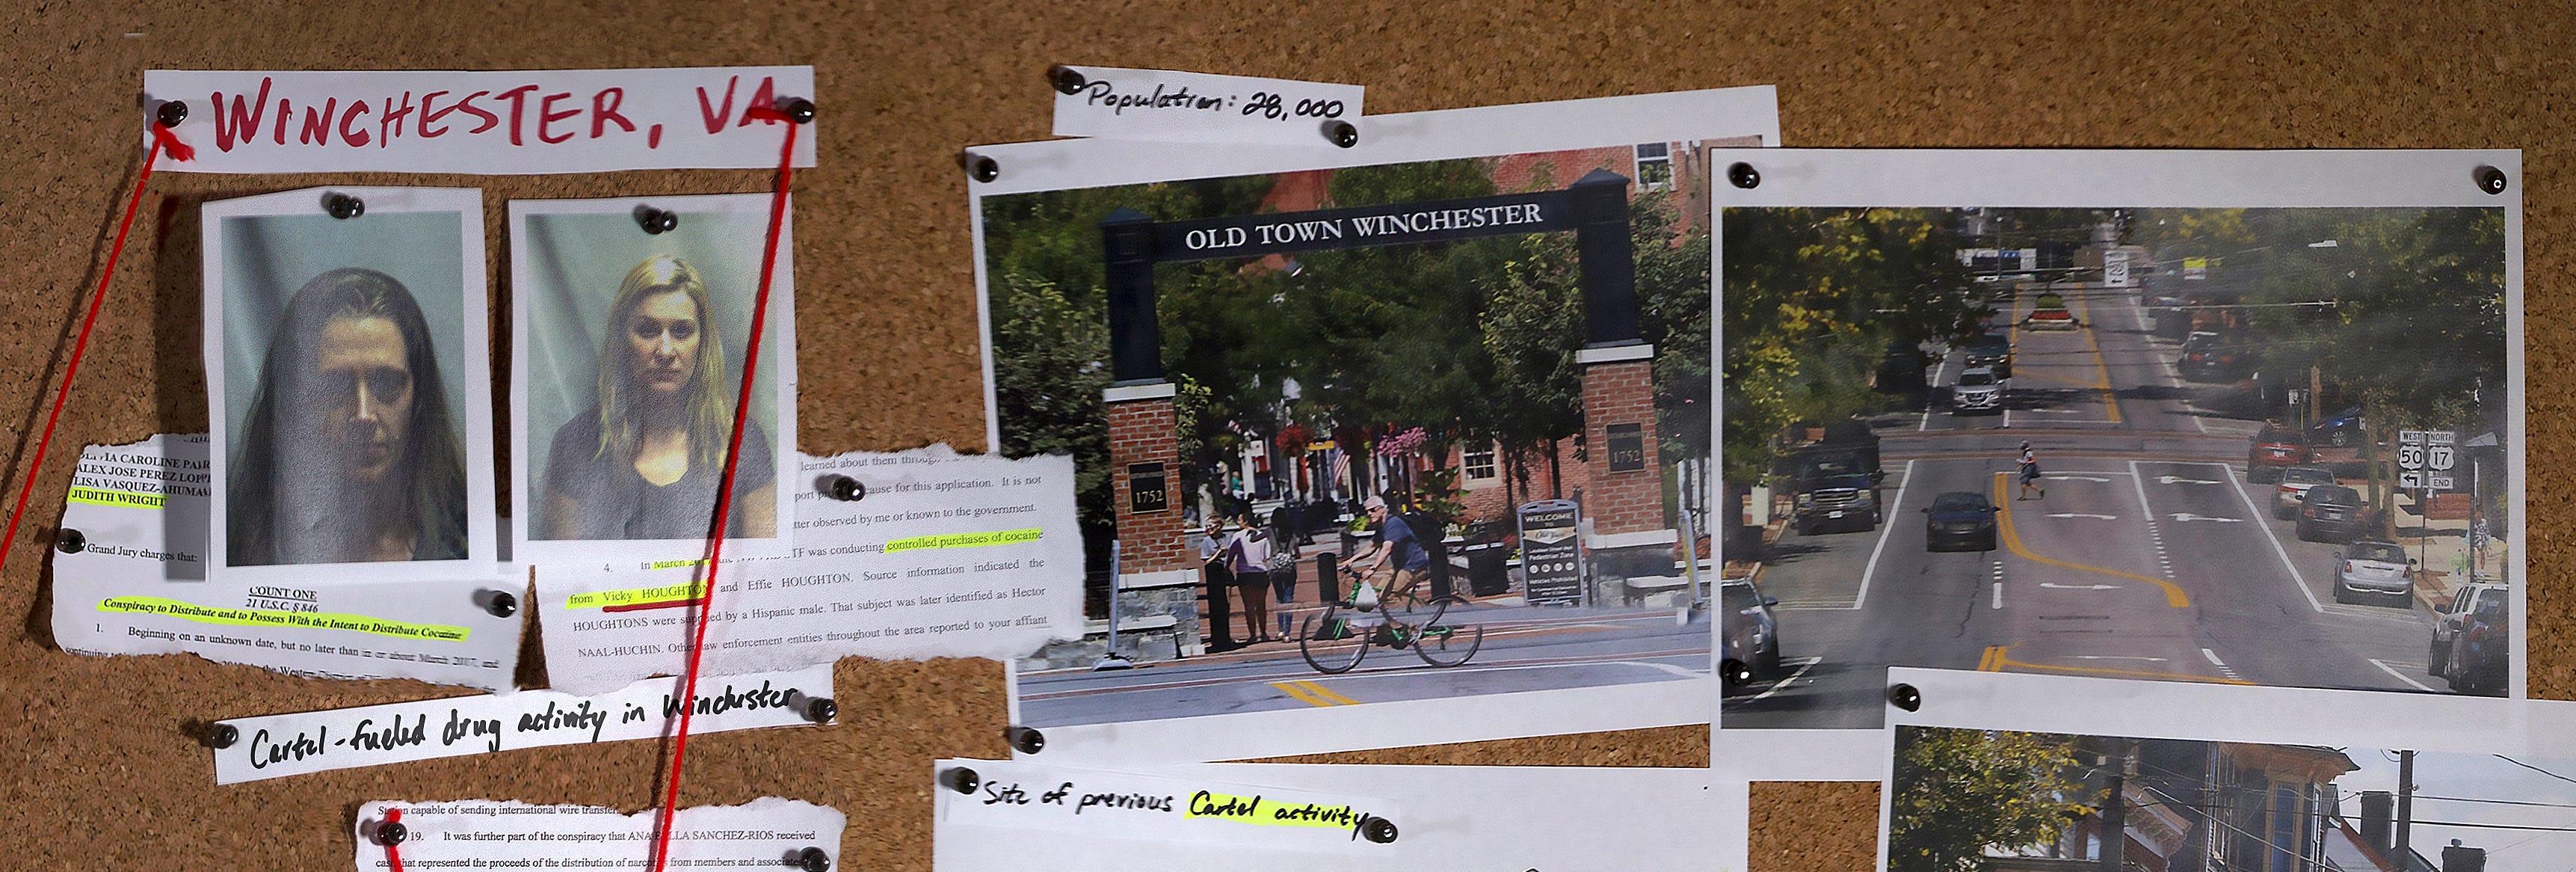 Winchester cartel link fuels expanding investigation